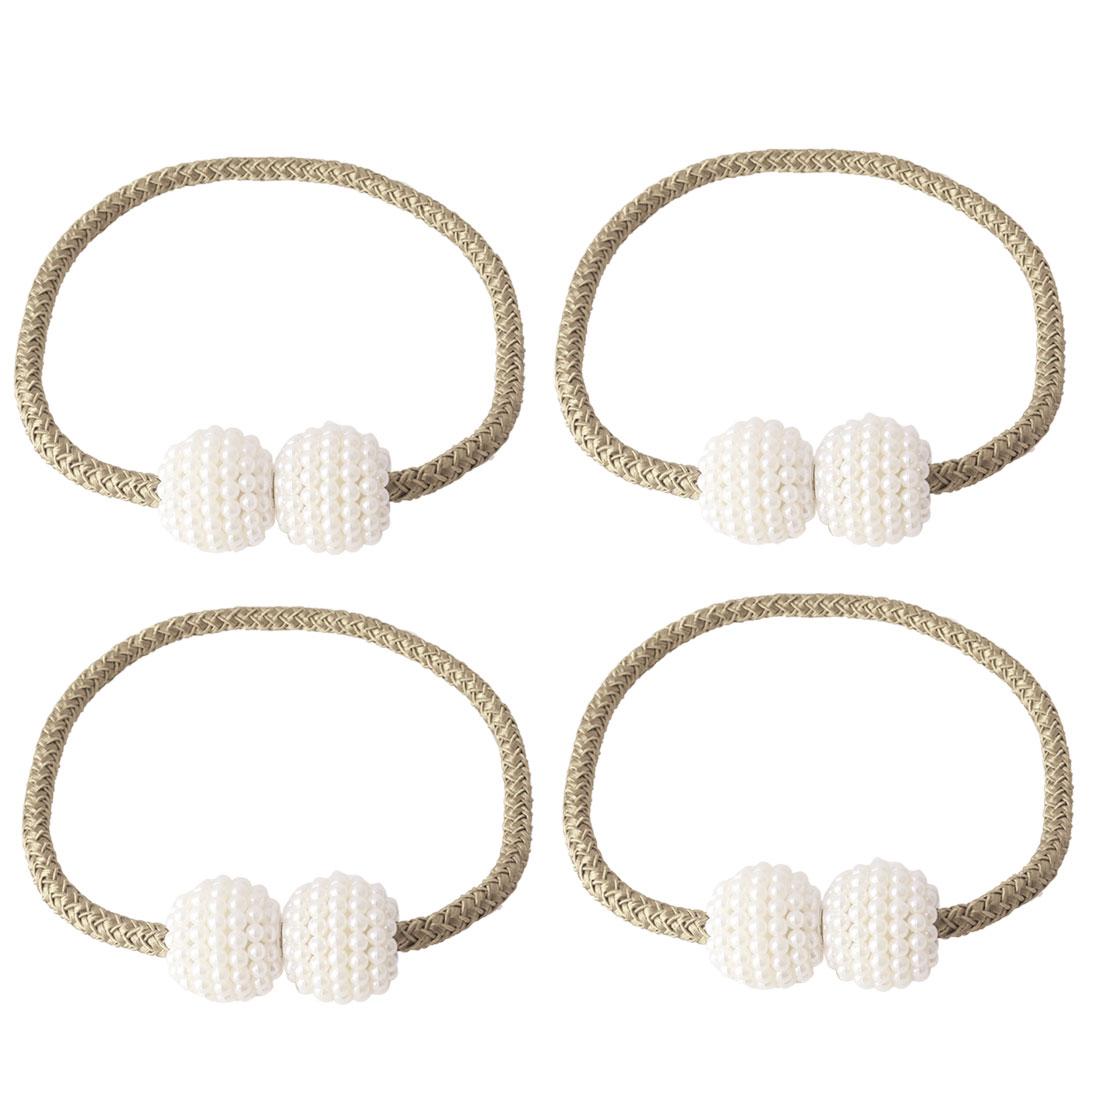 "4pcs Magnetic Curtain Tieback 19"" Holdbacks Decorative Curtain Holder, Ecru"